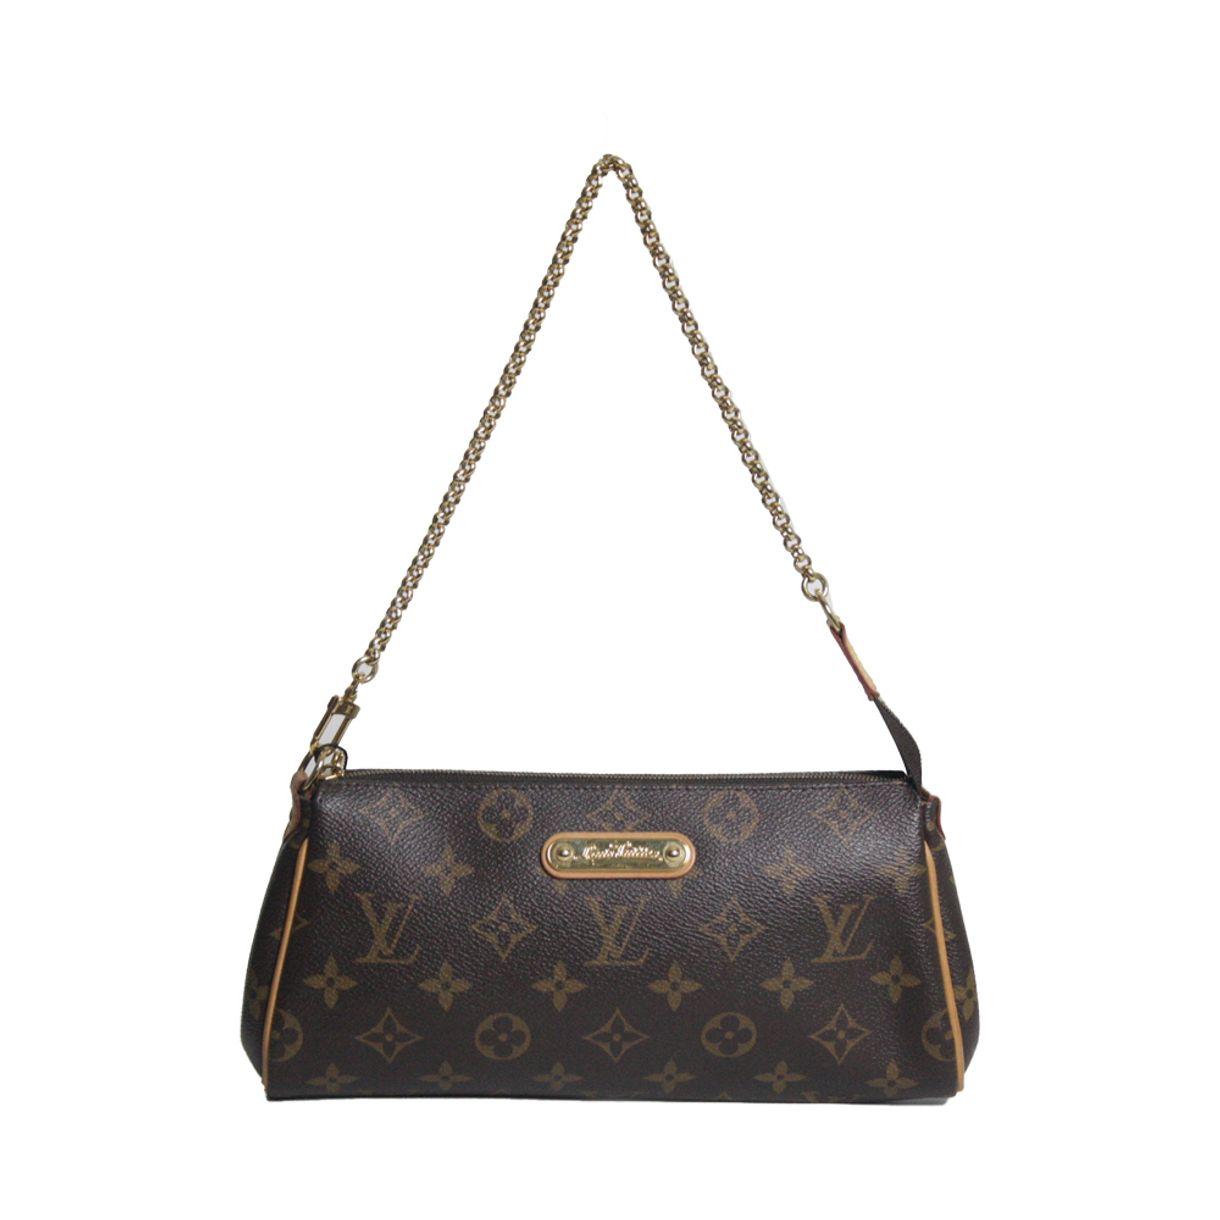 Bolsa-Louis-Vuitton-Eva-Clutch